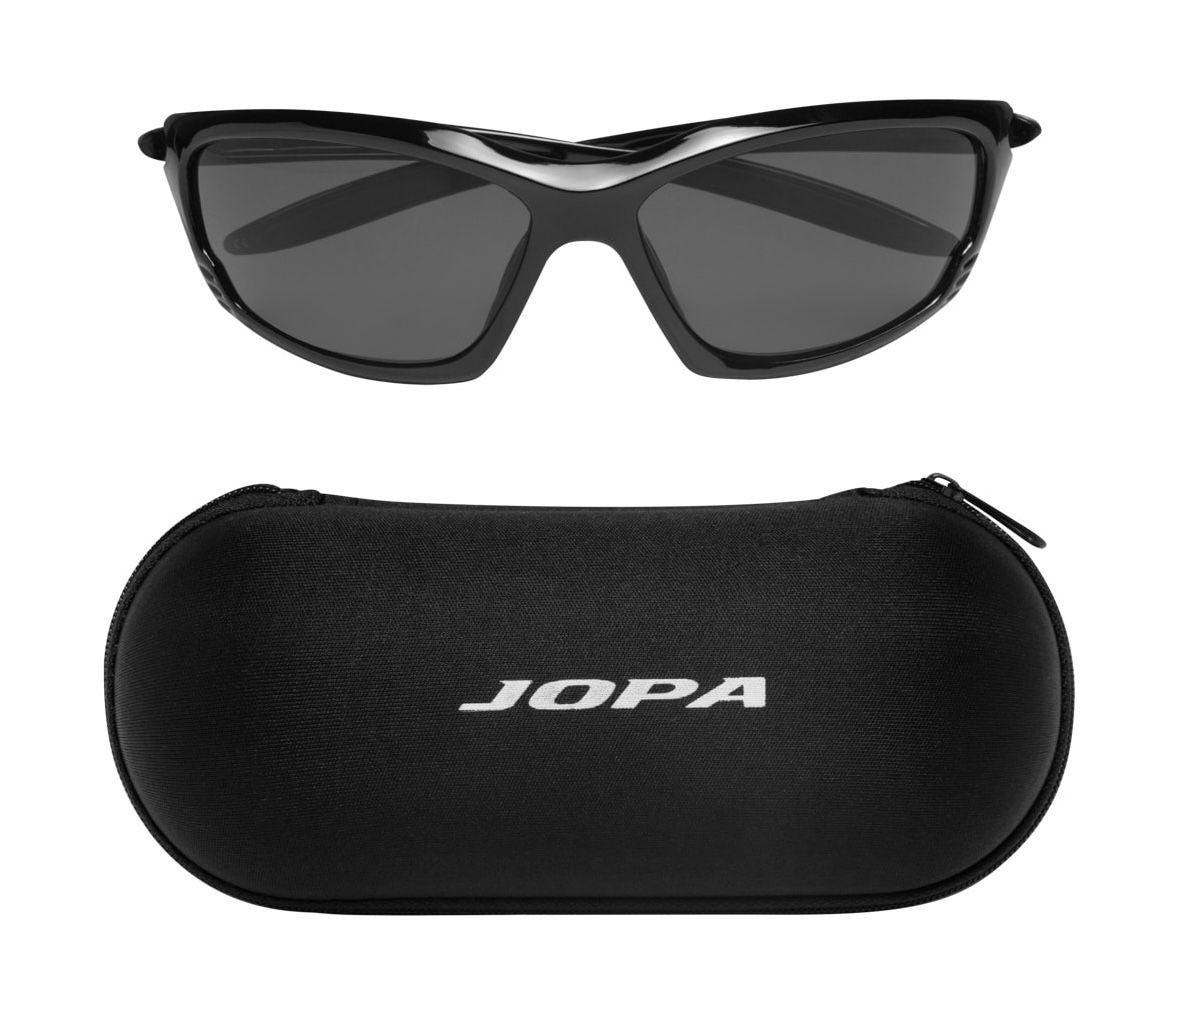 Jopa Sonnenbrillen inkl. Brillenetui für je 3,99€ + VSK (statt 14€)